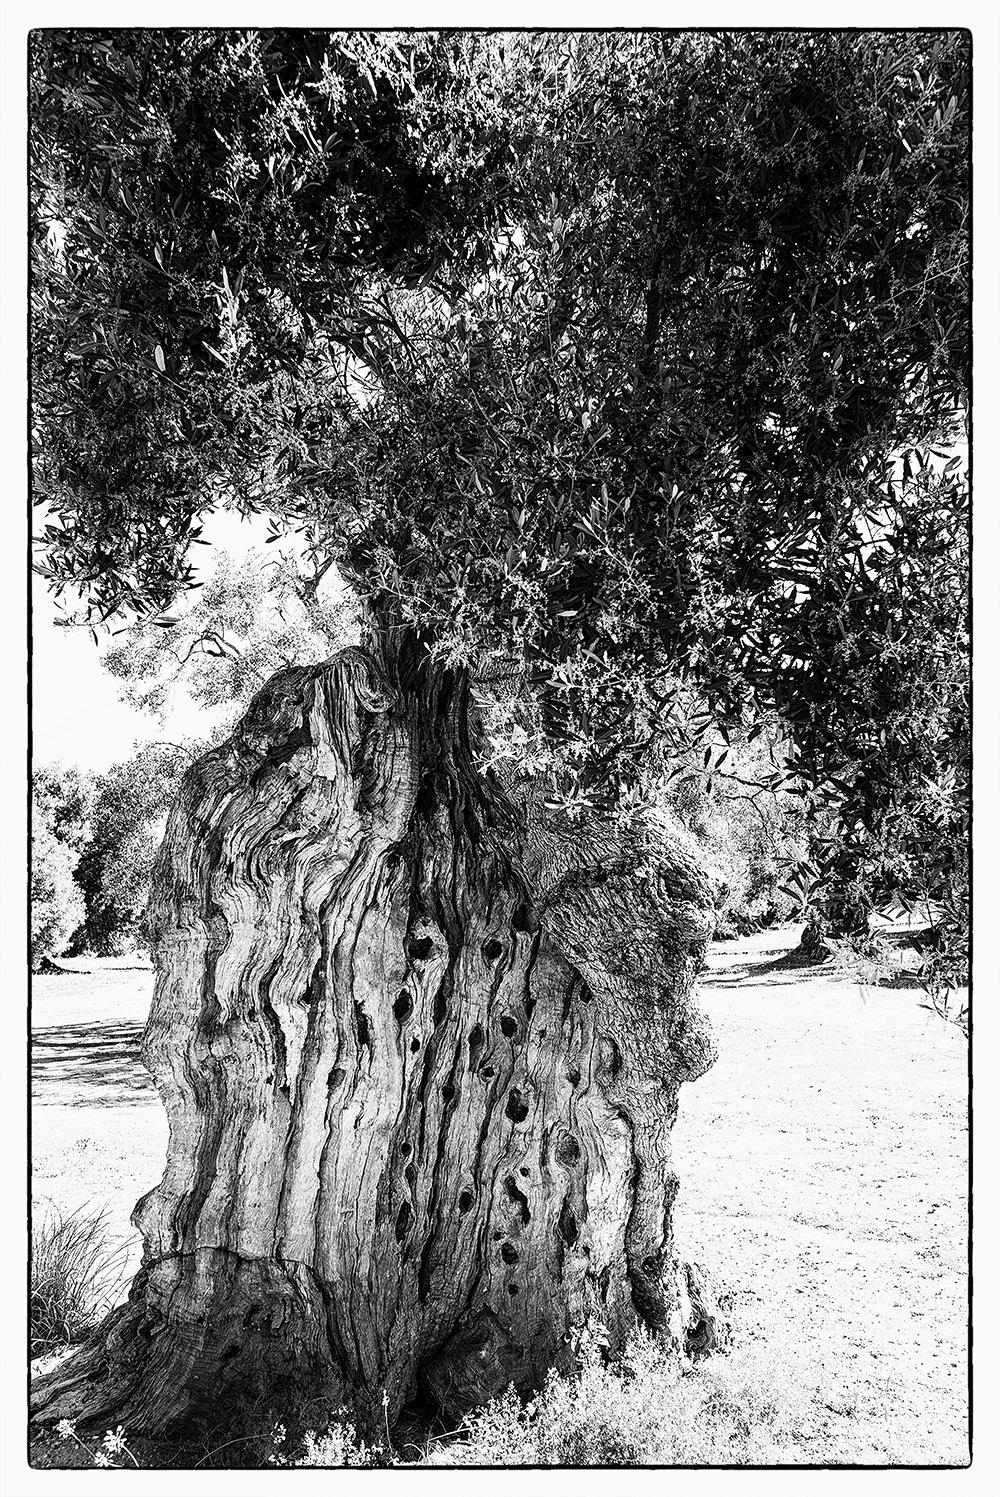 Fotowerk Naturfotografie - alte Olivenbäume